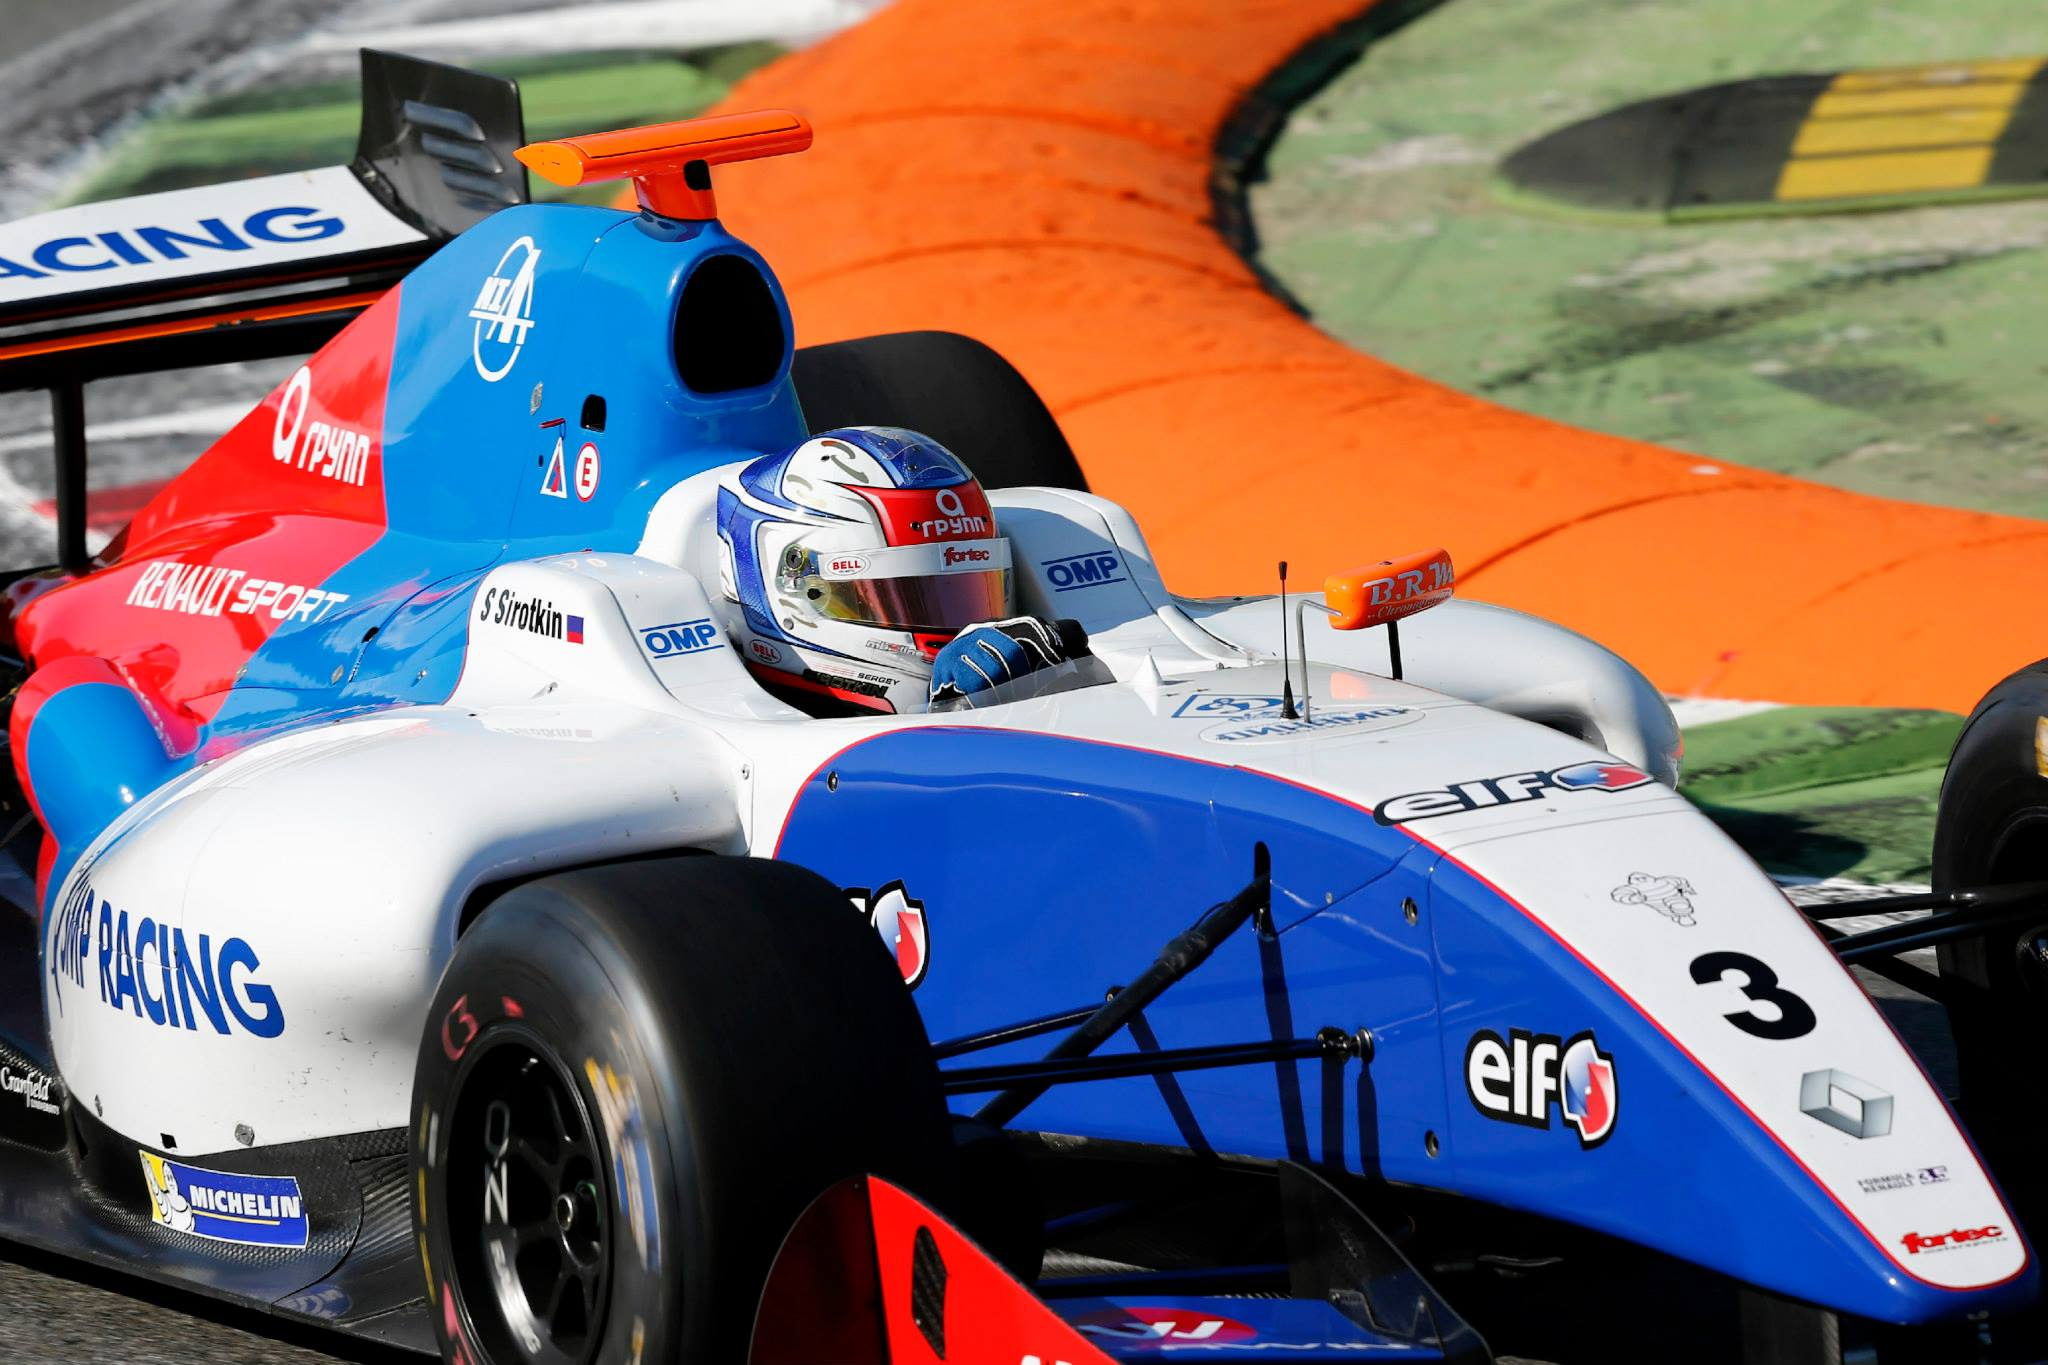 2014 Formula Renault 3.5 Series monza